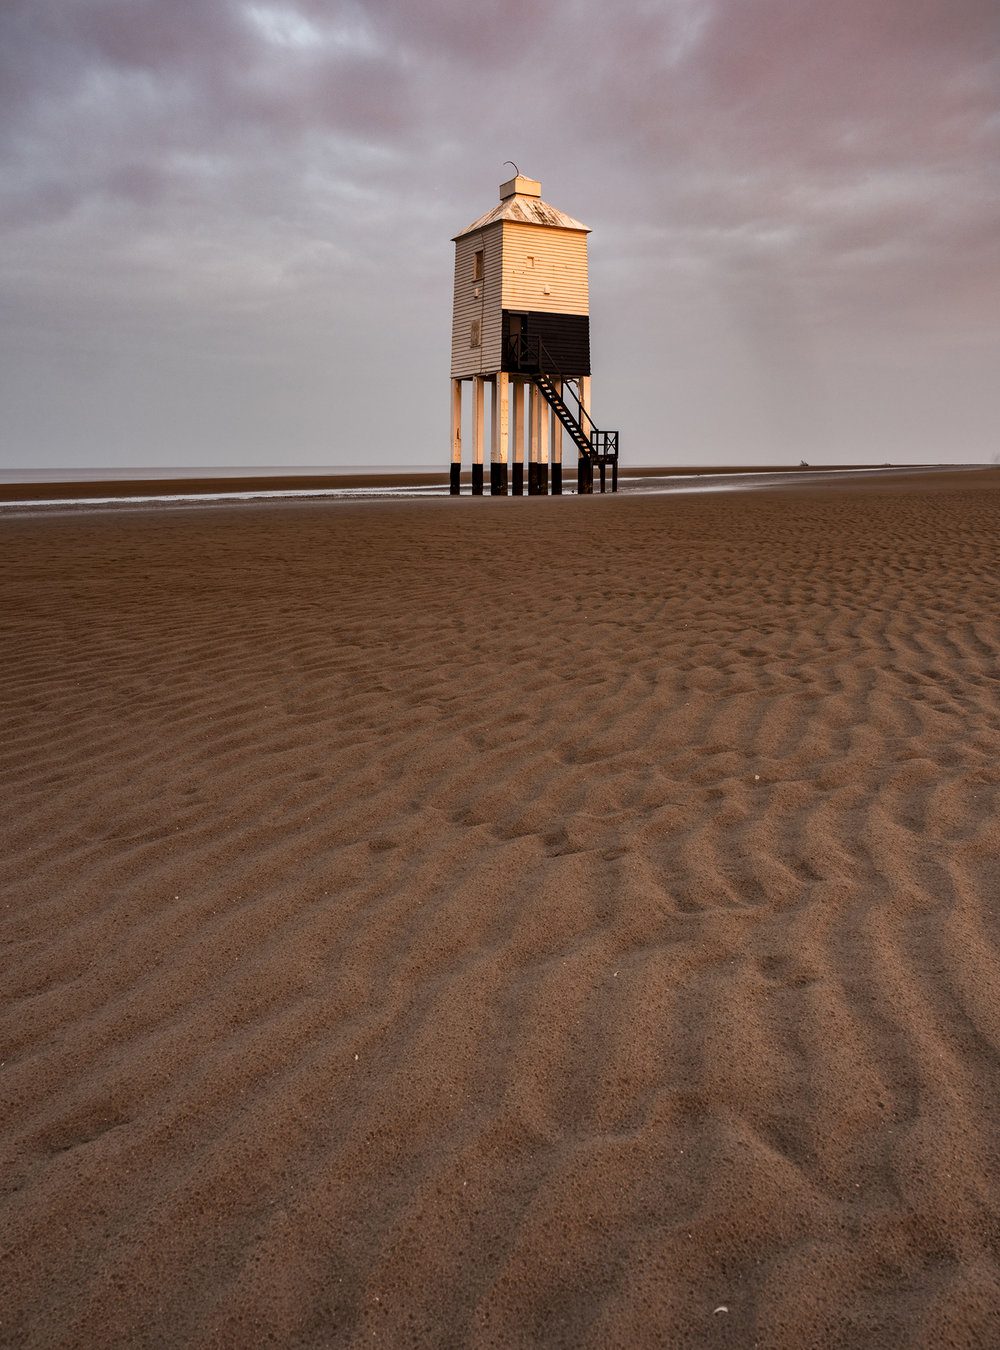 Burnham-on-sea low lighthouse at sunrise